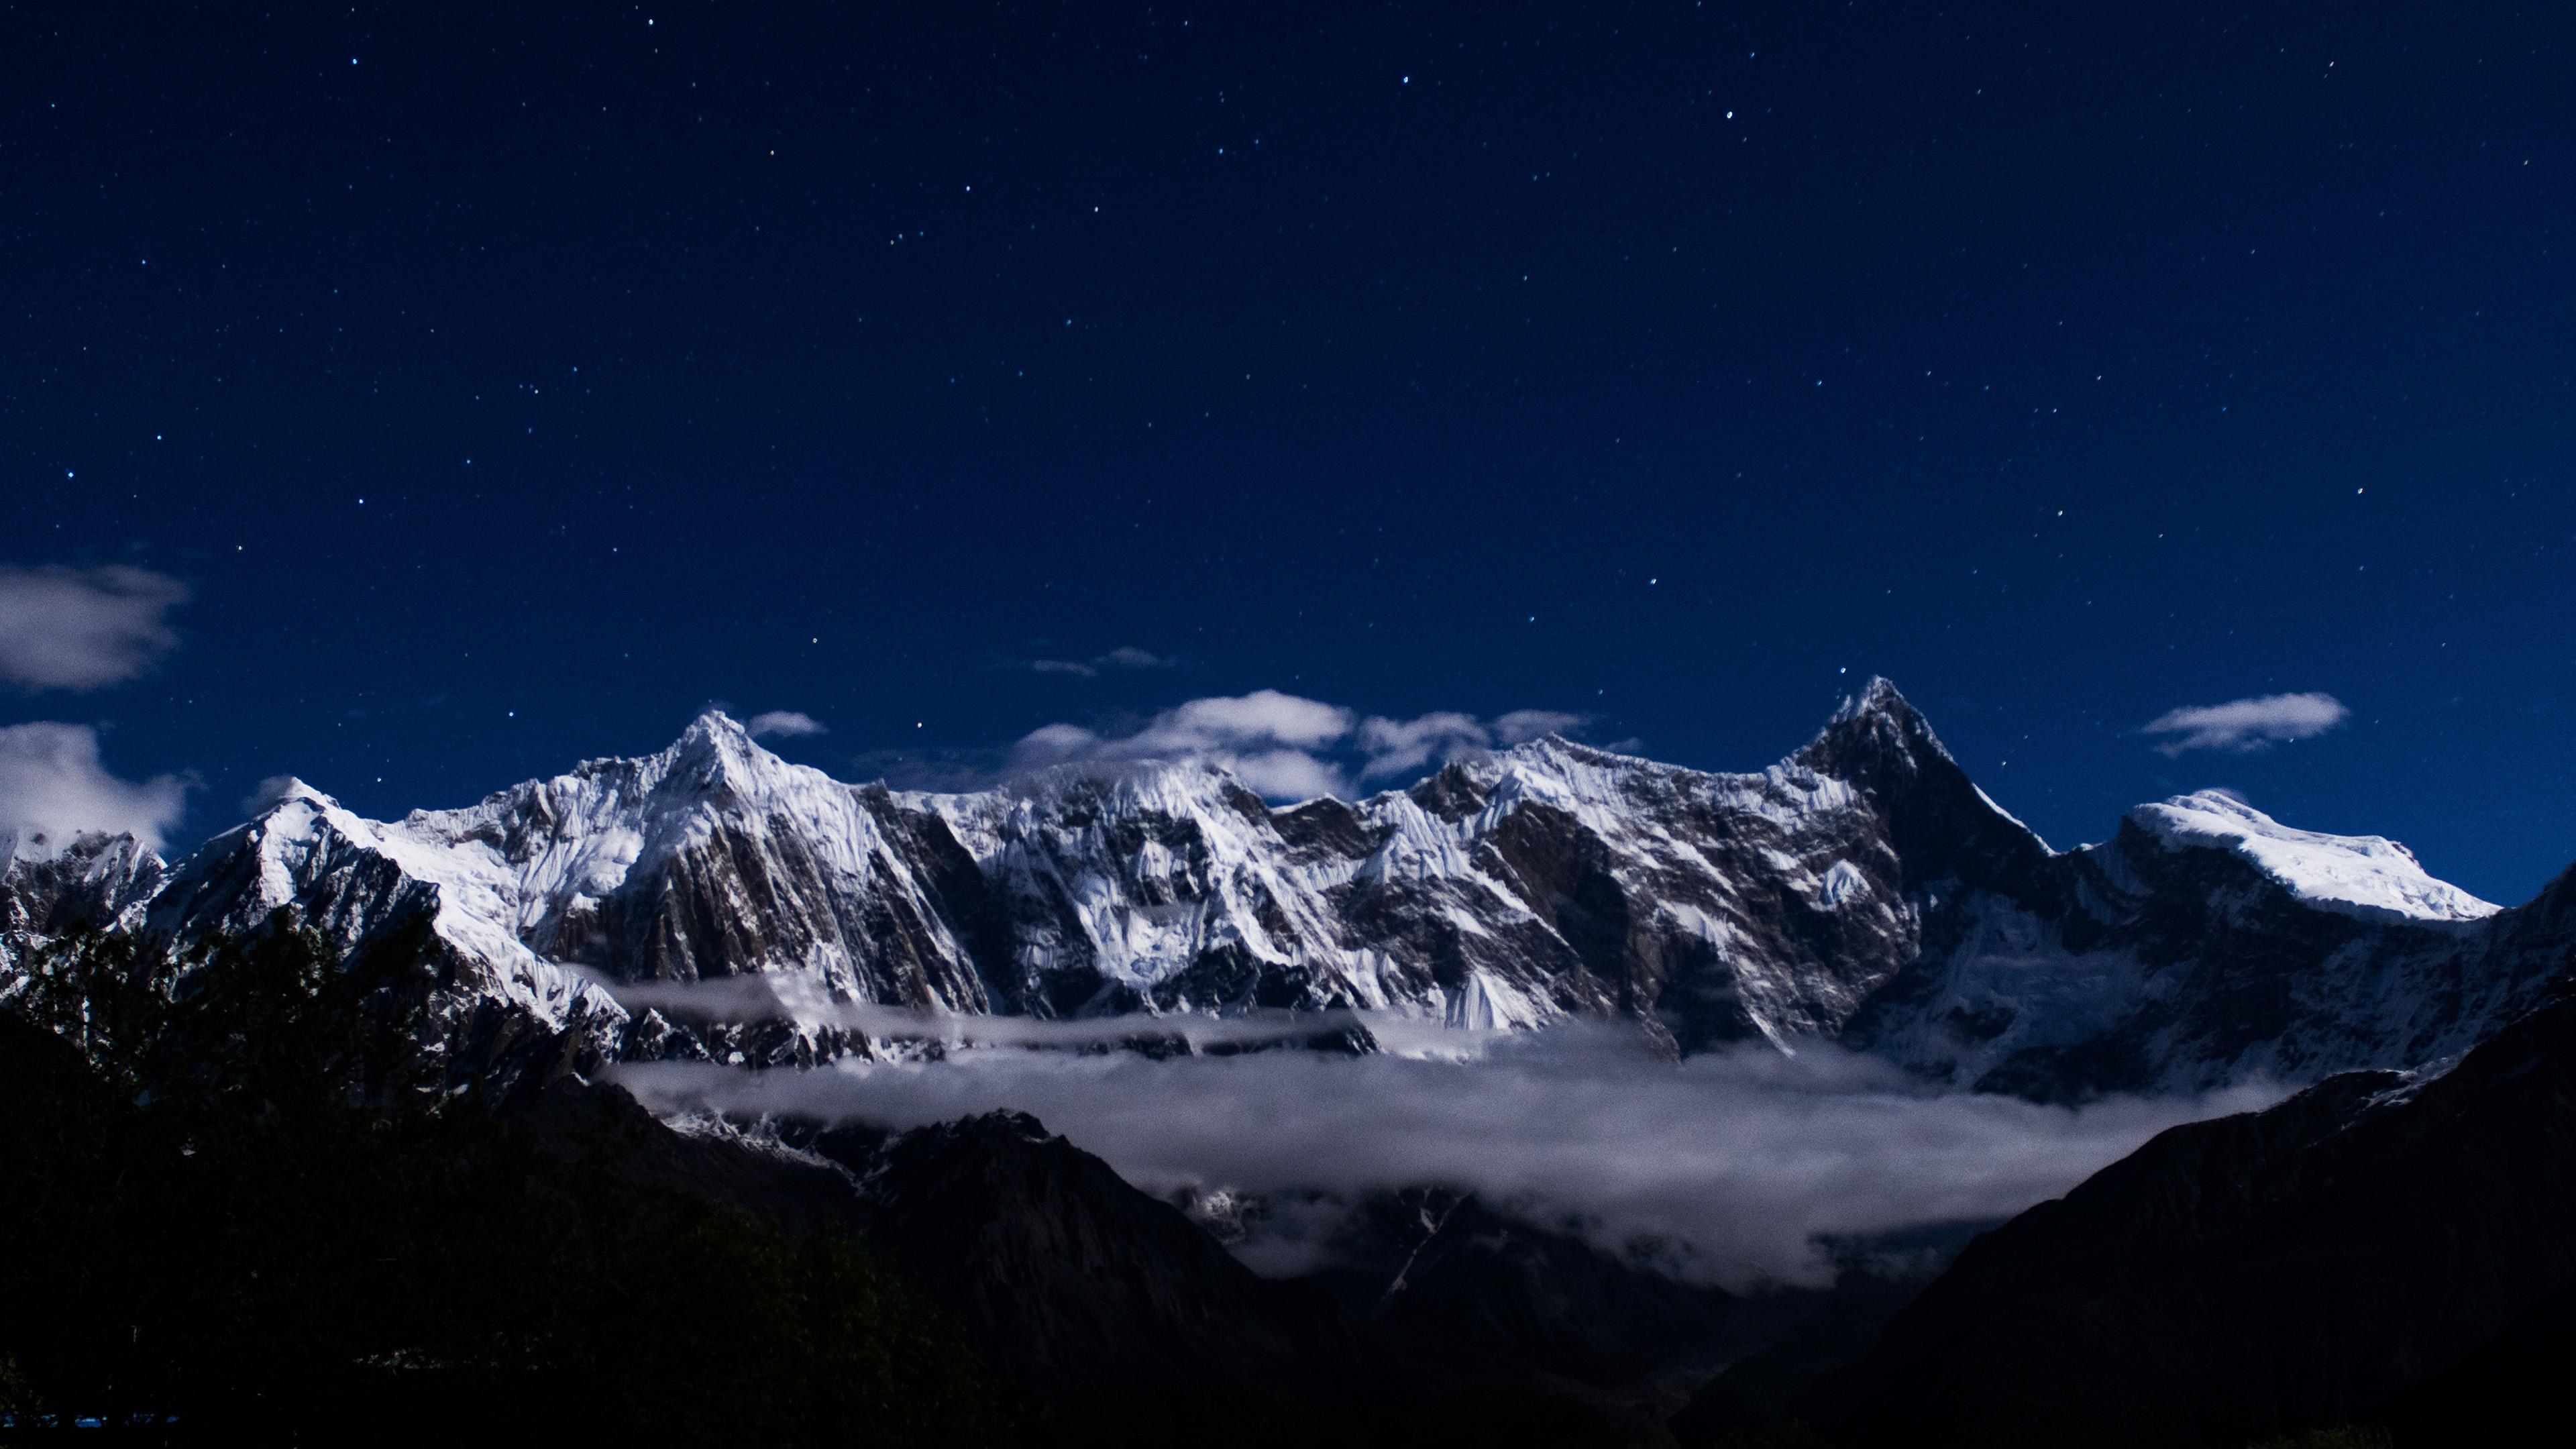 3d Wallpaper For Iphone Se Ng40 Mountain Snow Dark Winter Sky Star Wallpaper